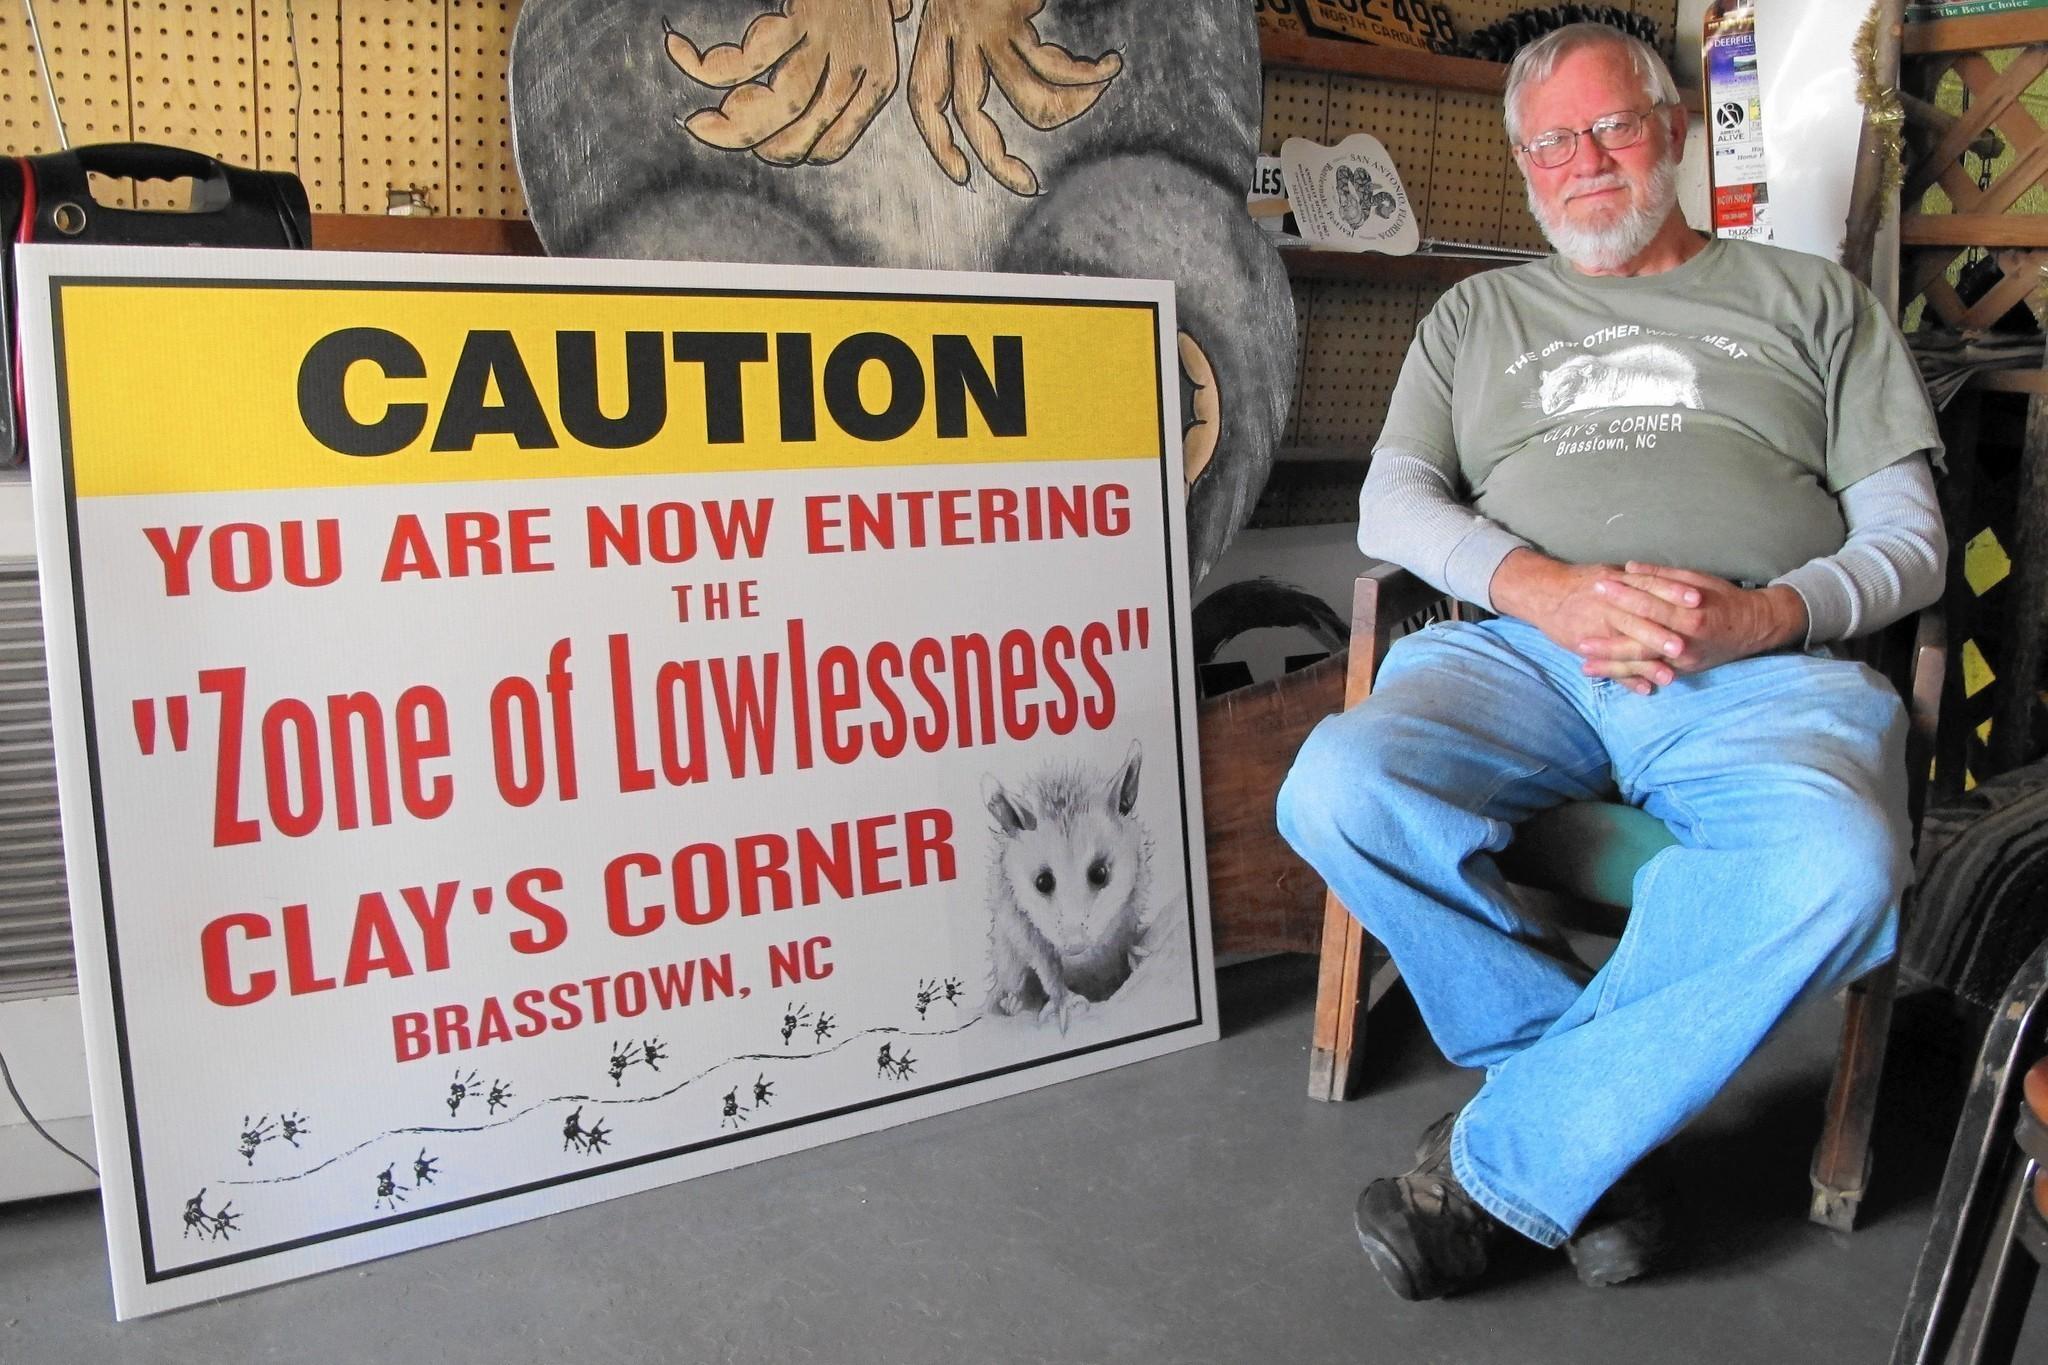 It's PETA vs. the Possum Drop in a New Year's legal struggle